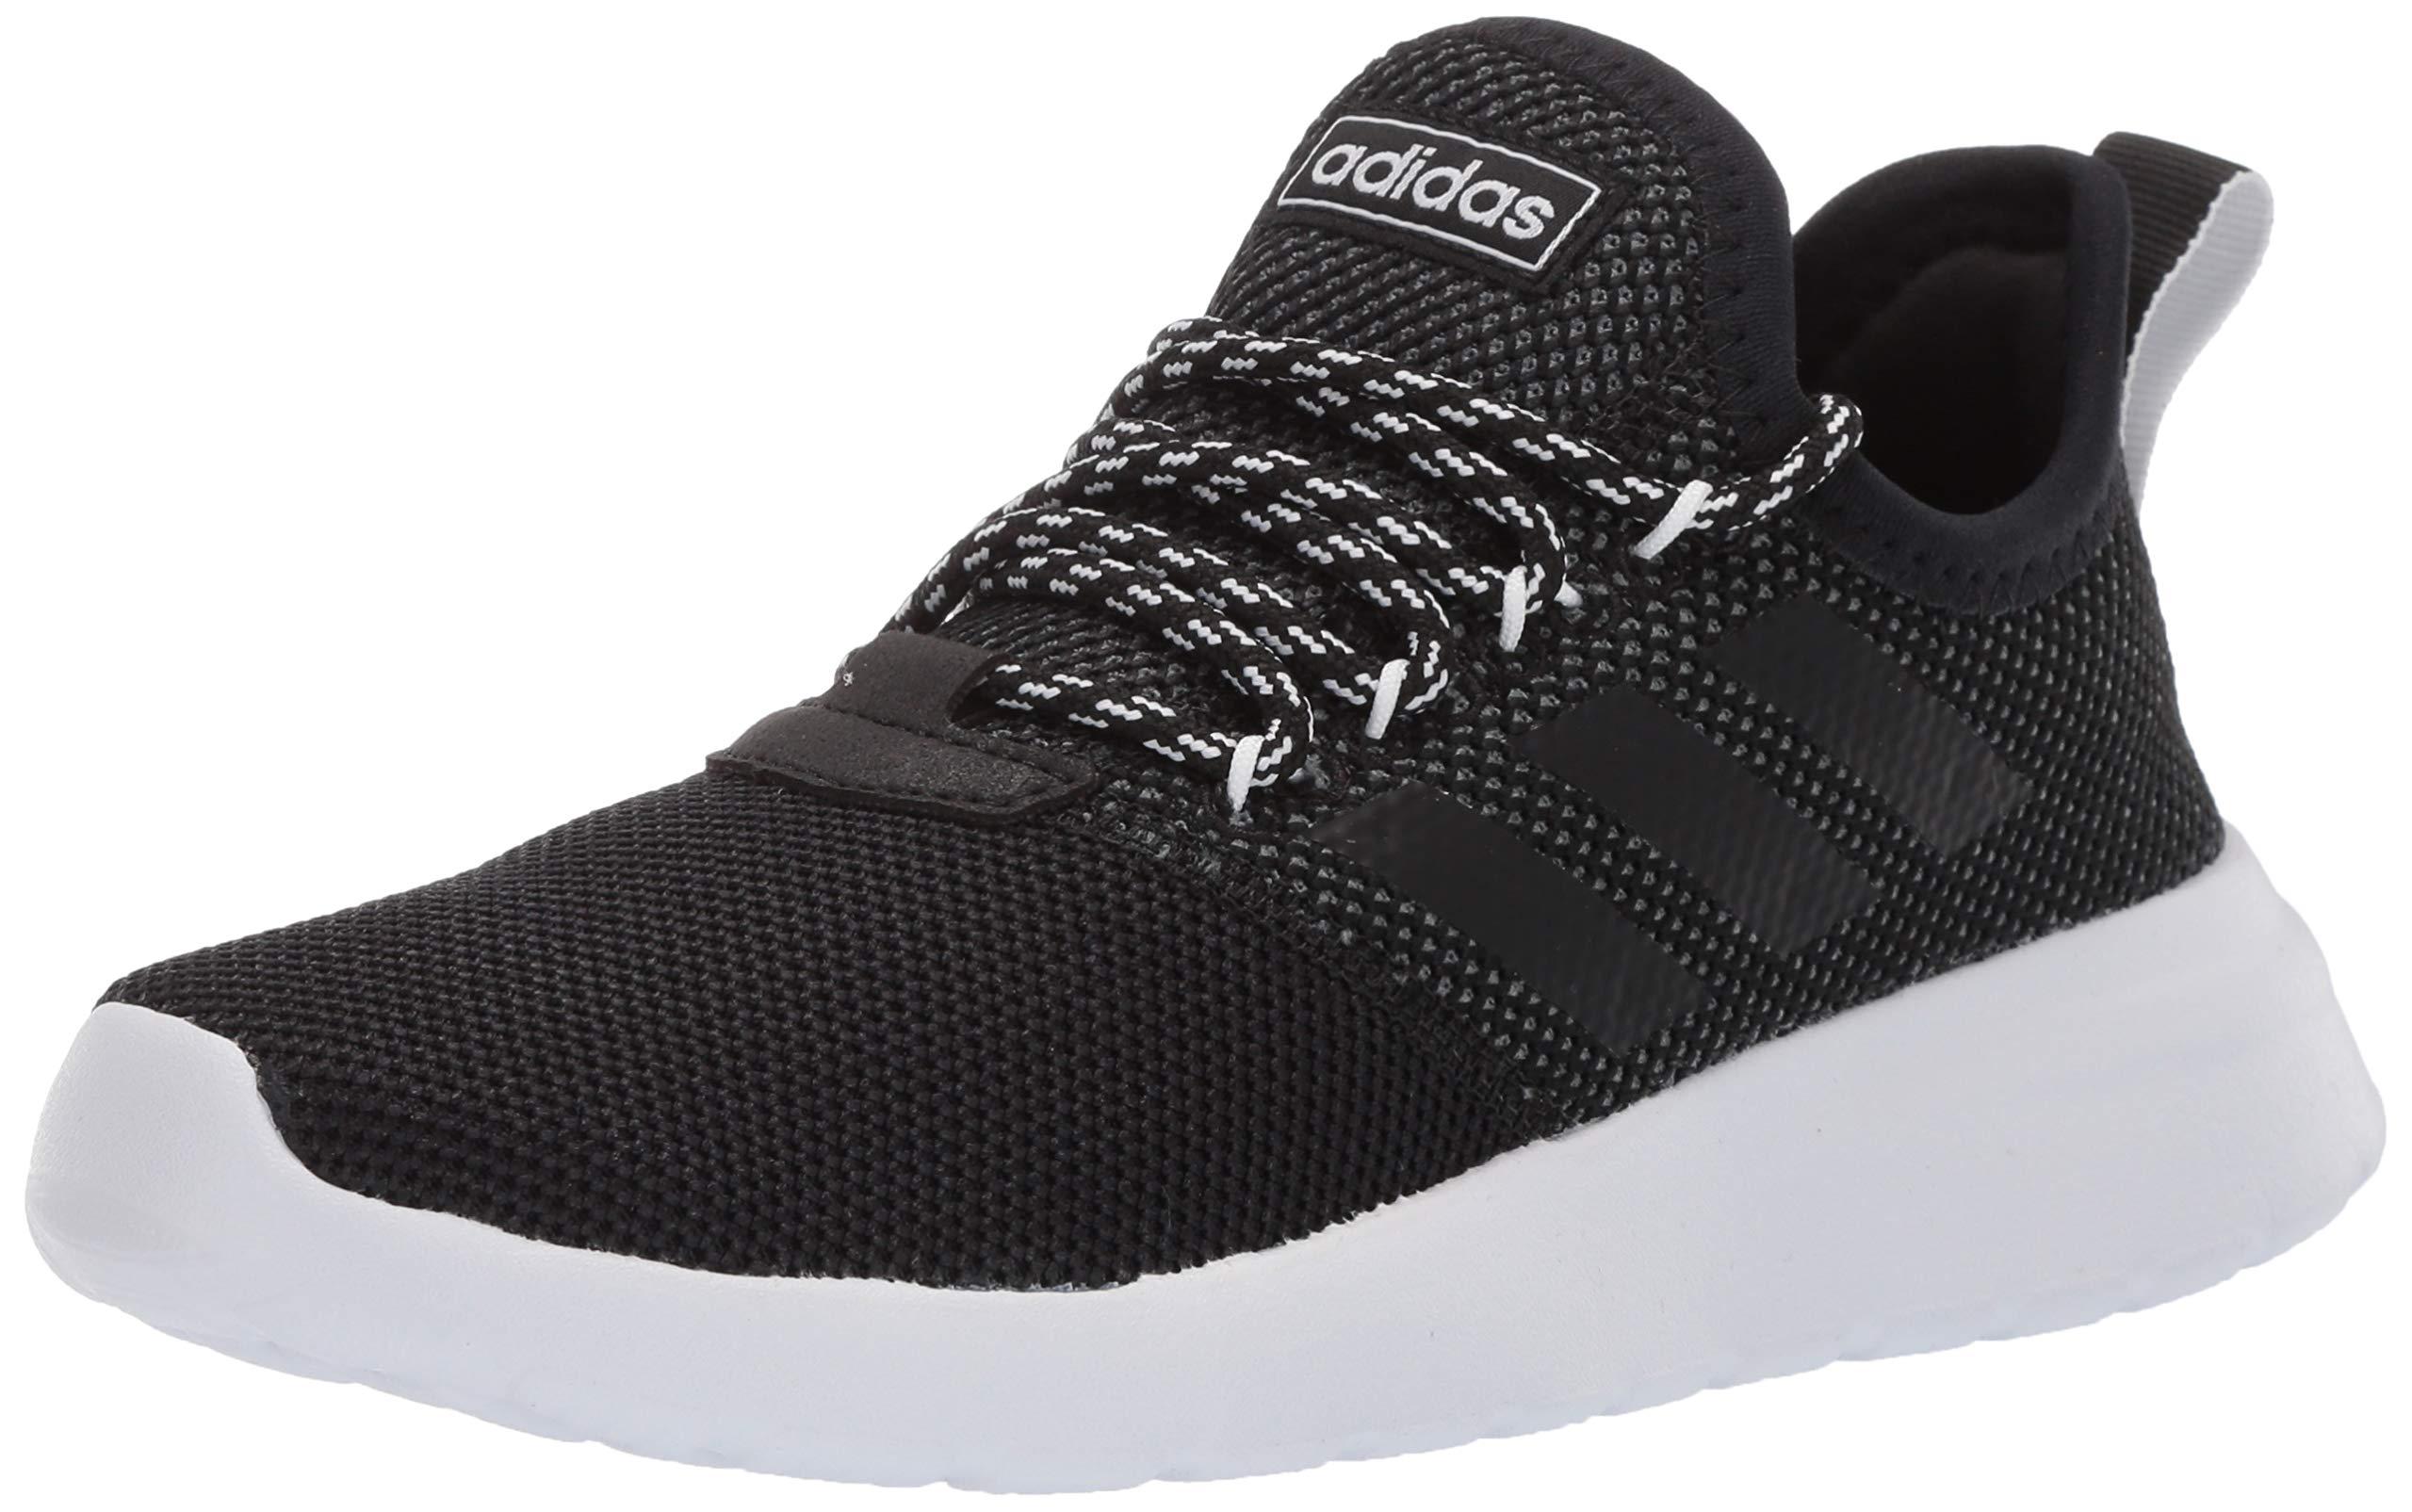 adidas Women's Lite Racer Reborn, Black/Grey, 5 M US